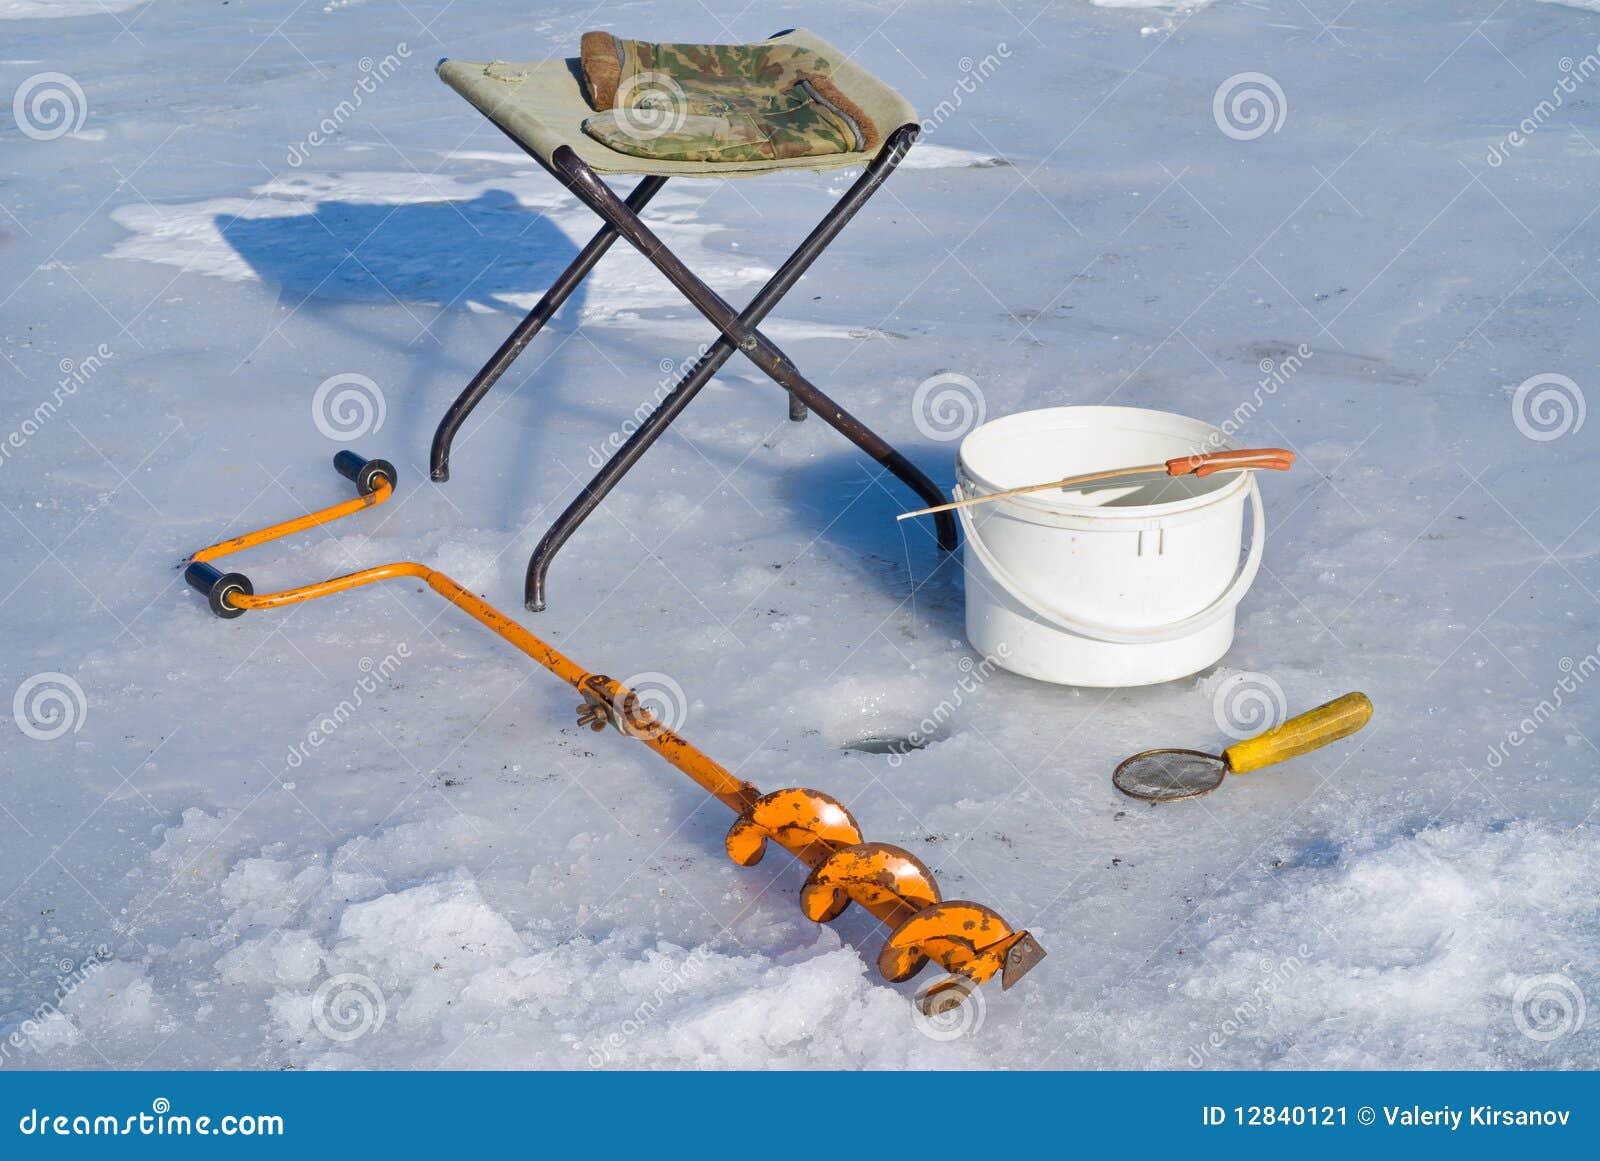 Fishing on ice equipment 4 stock image image 12840121 for Ice fishing tools